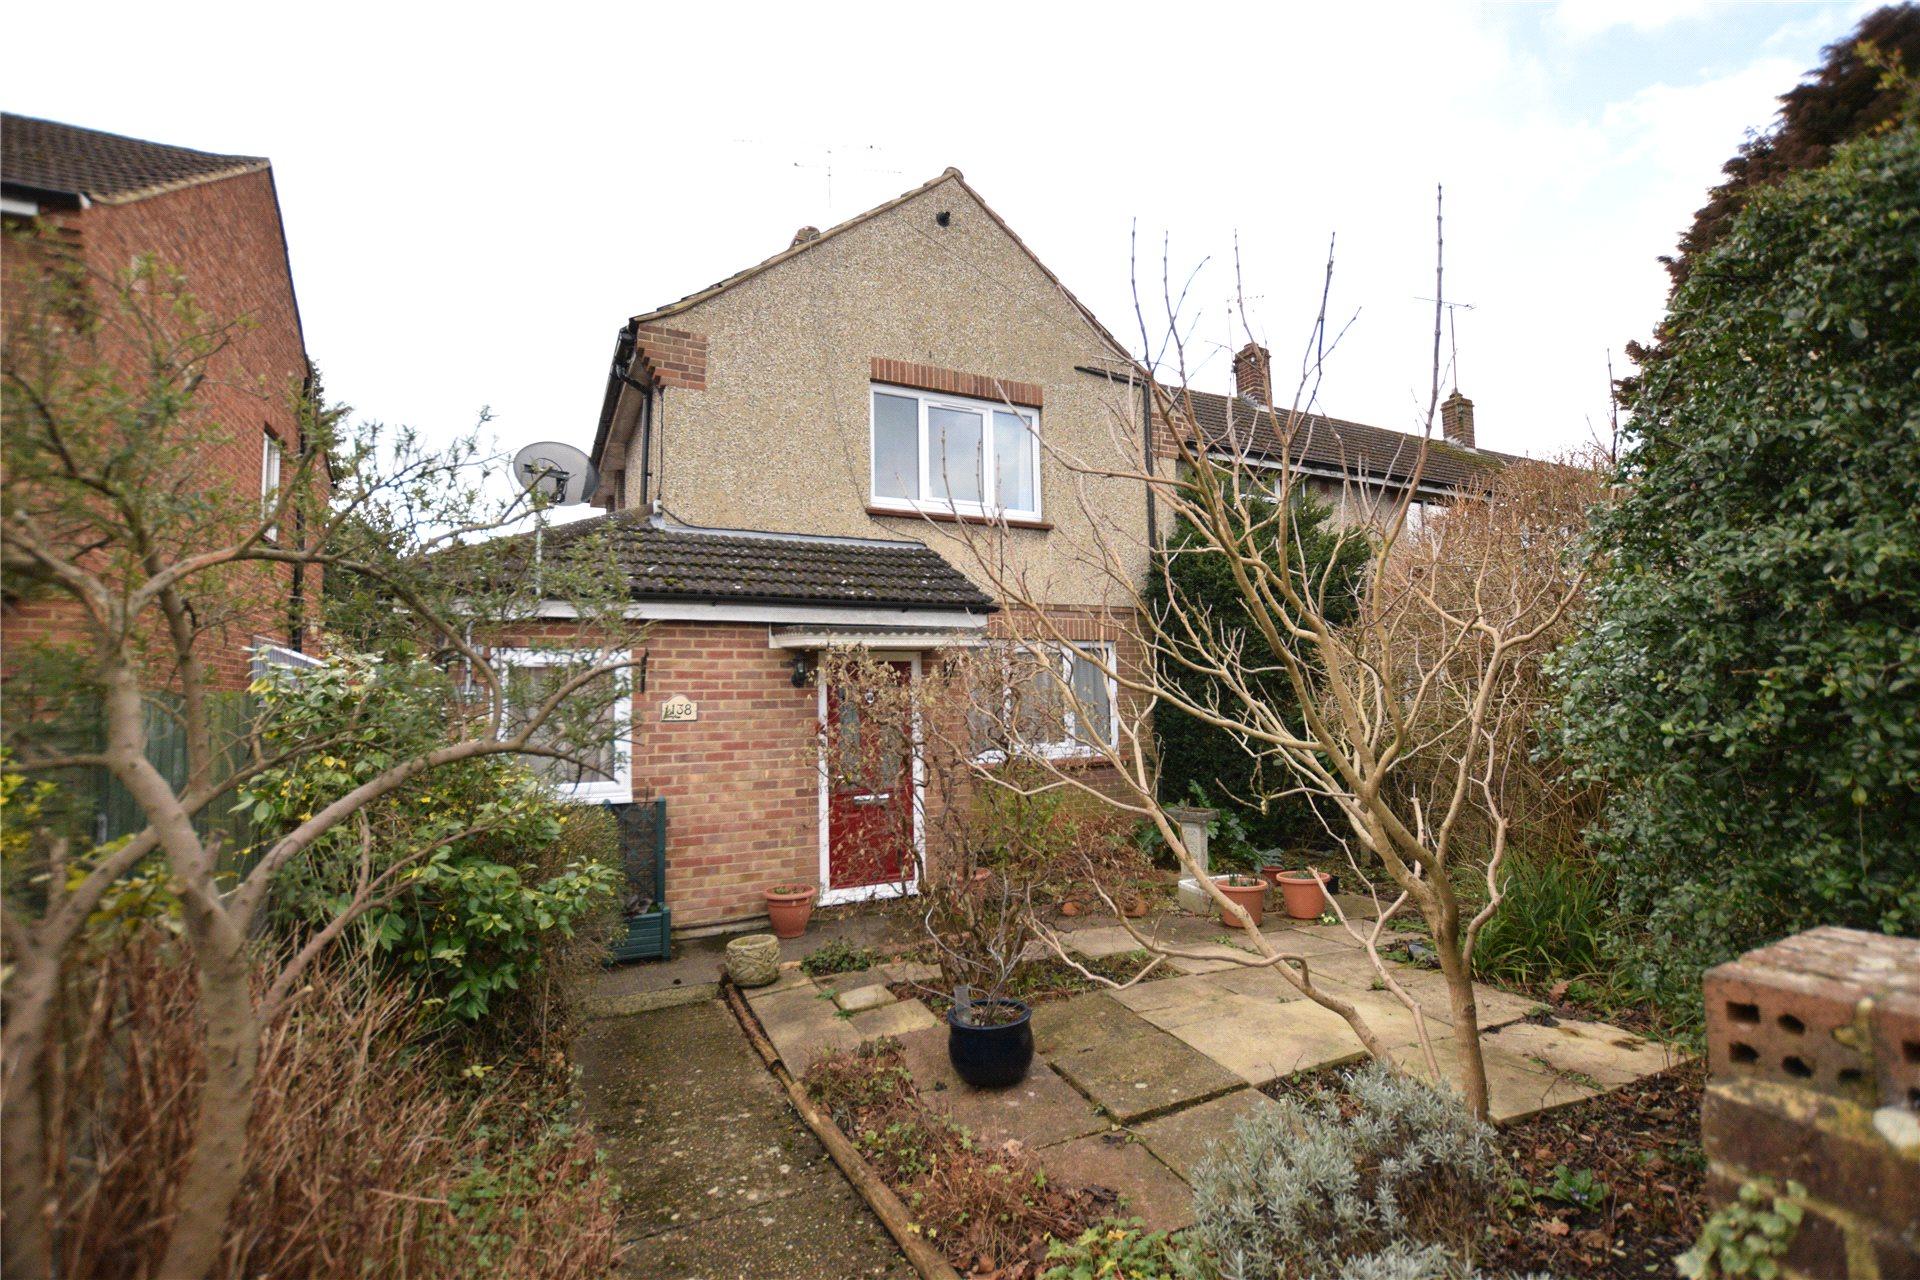 2 Bedrooms Terraced House for sale in Upper College Ride, Camberley, Surrey, GU15